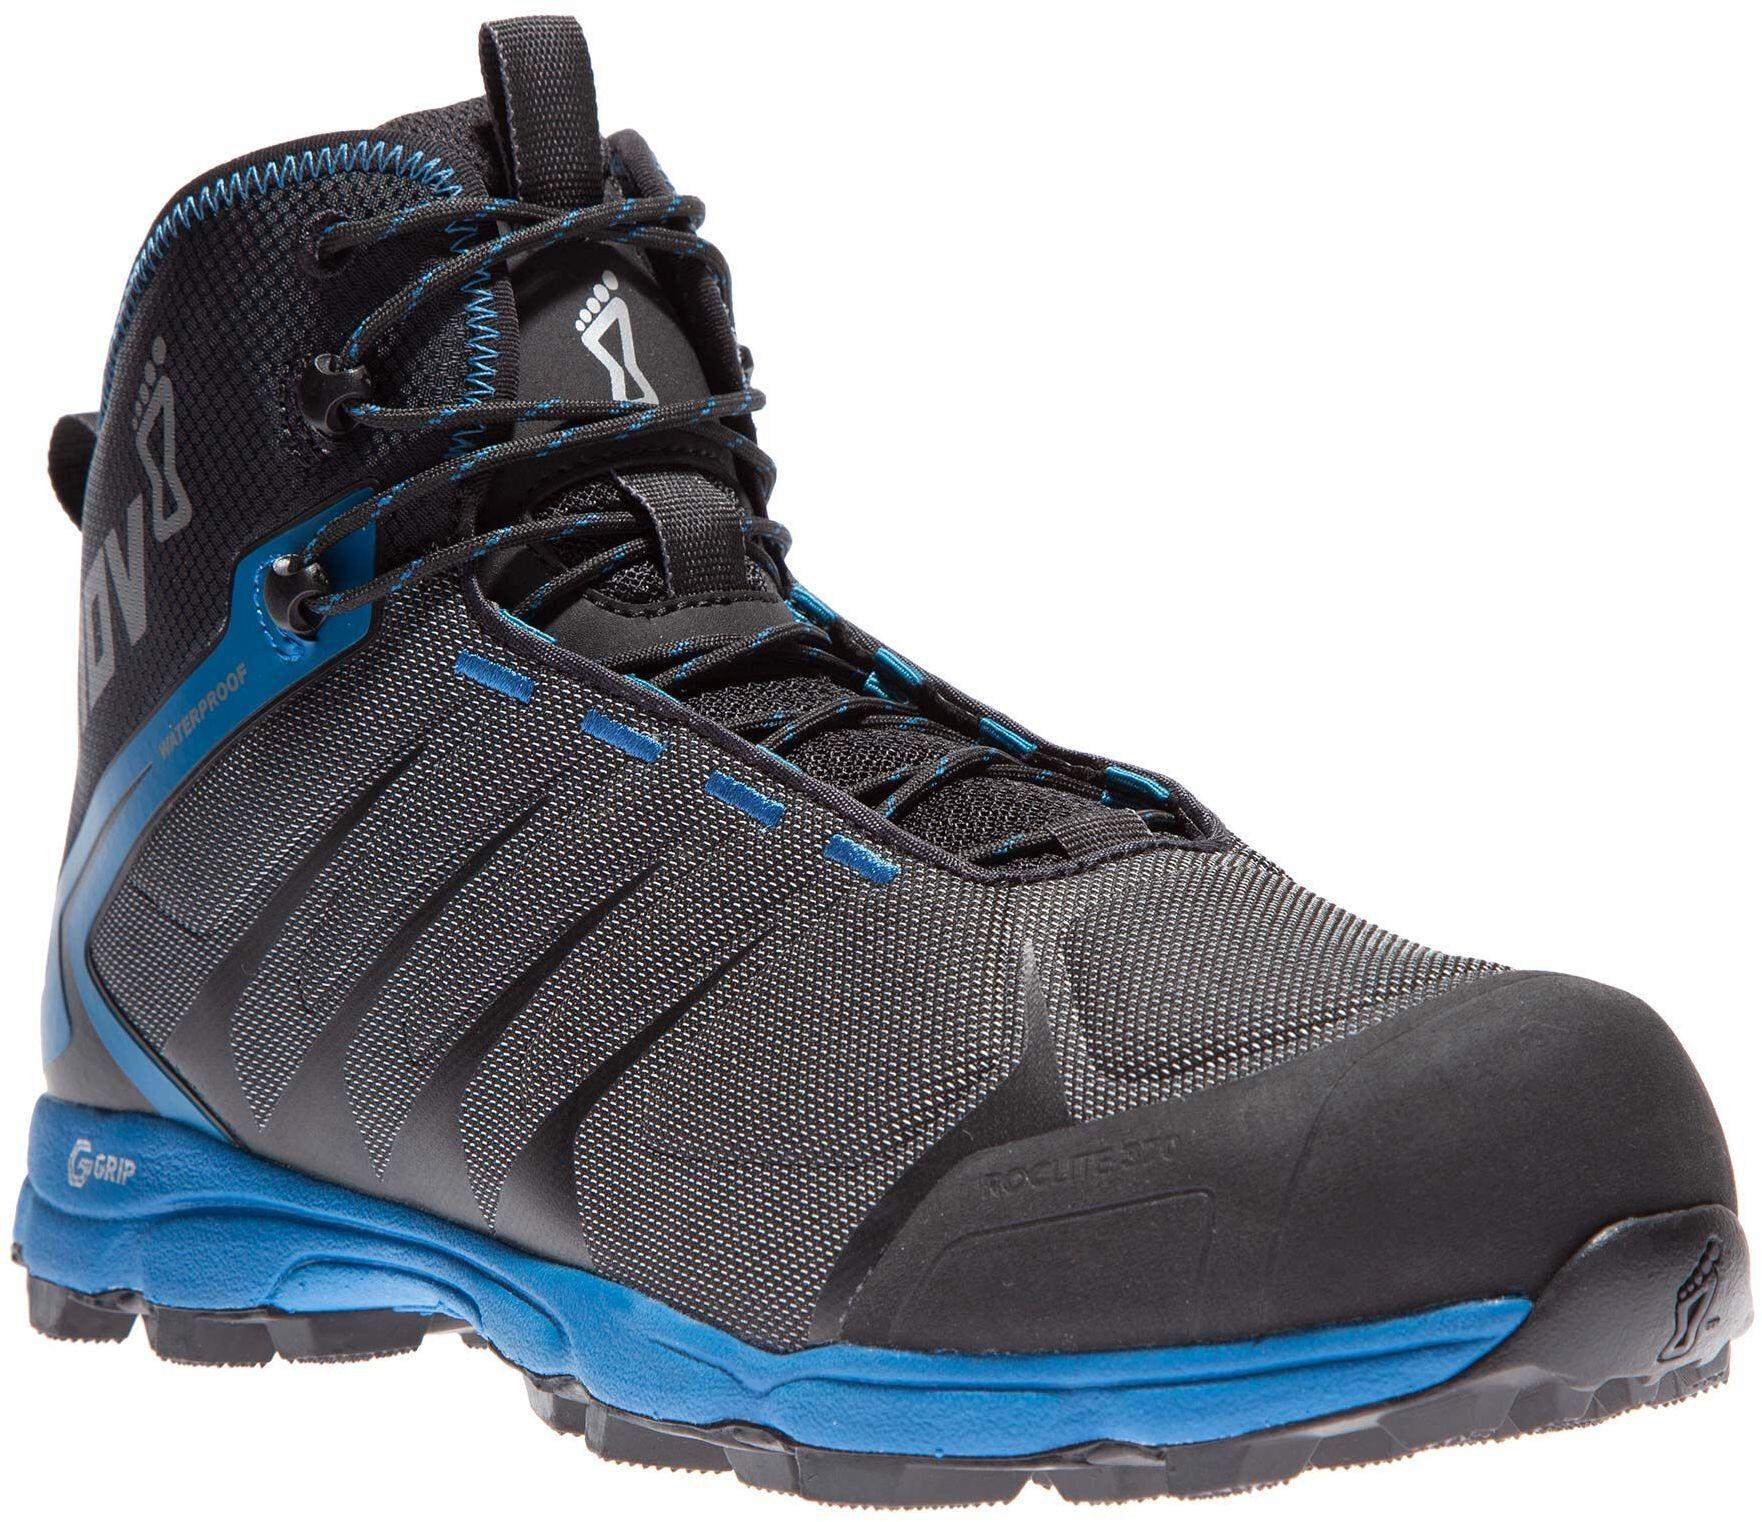 promo code 5594d 70953 inov-8 Roclite 370 Shoes Men black/blue